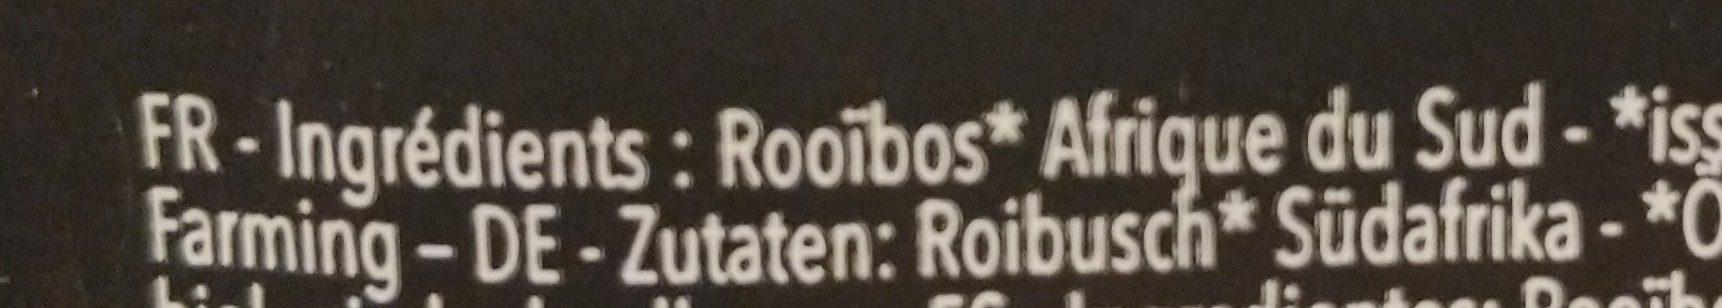 The ROUGE AF DU SUD ROOIBOS - Ingredientes - fr